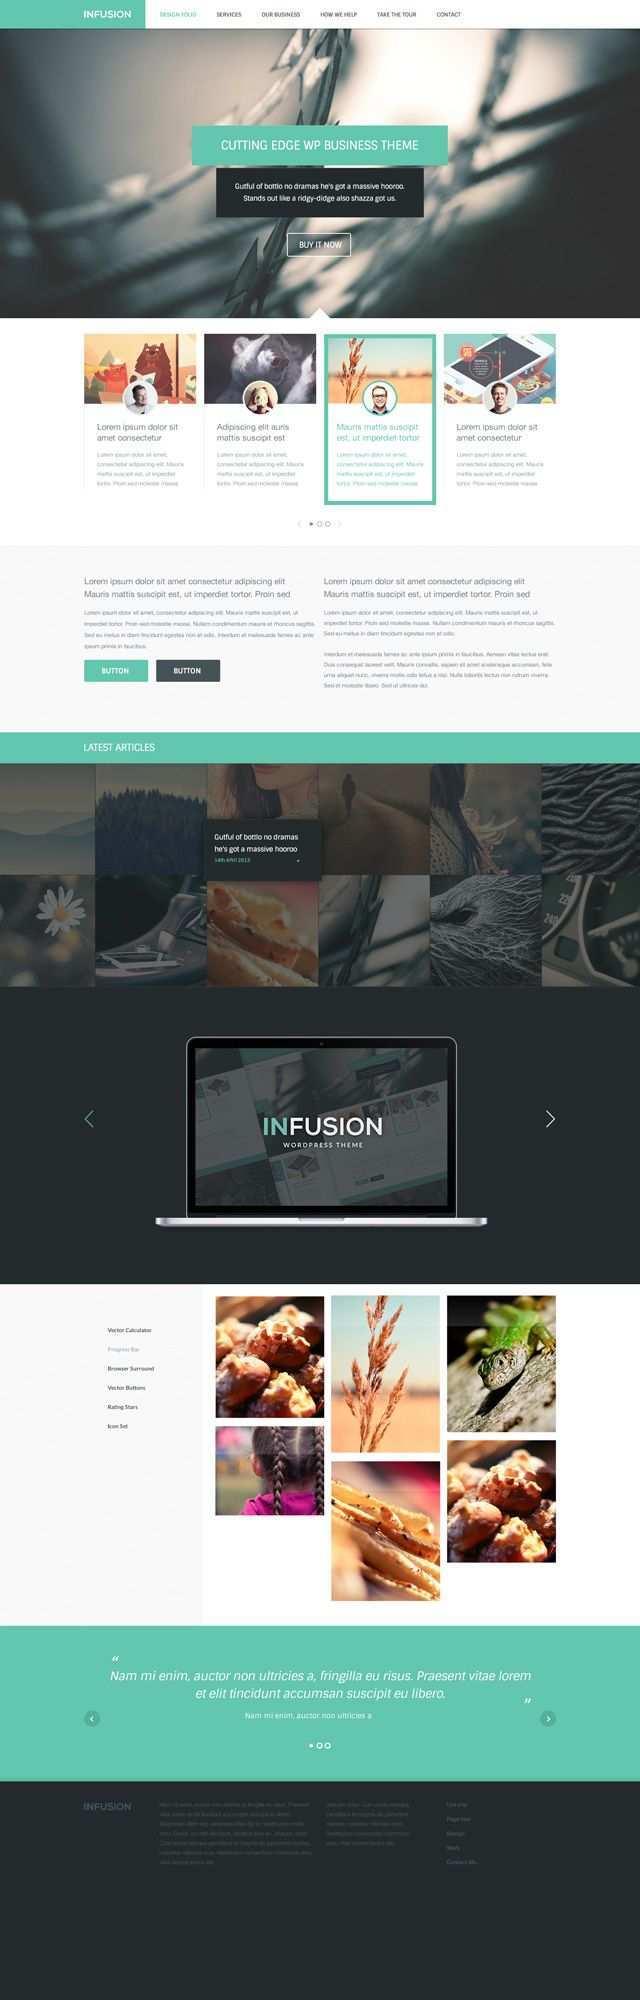 Pin Su Web Design User Interfaces Inspiration